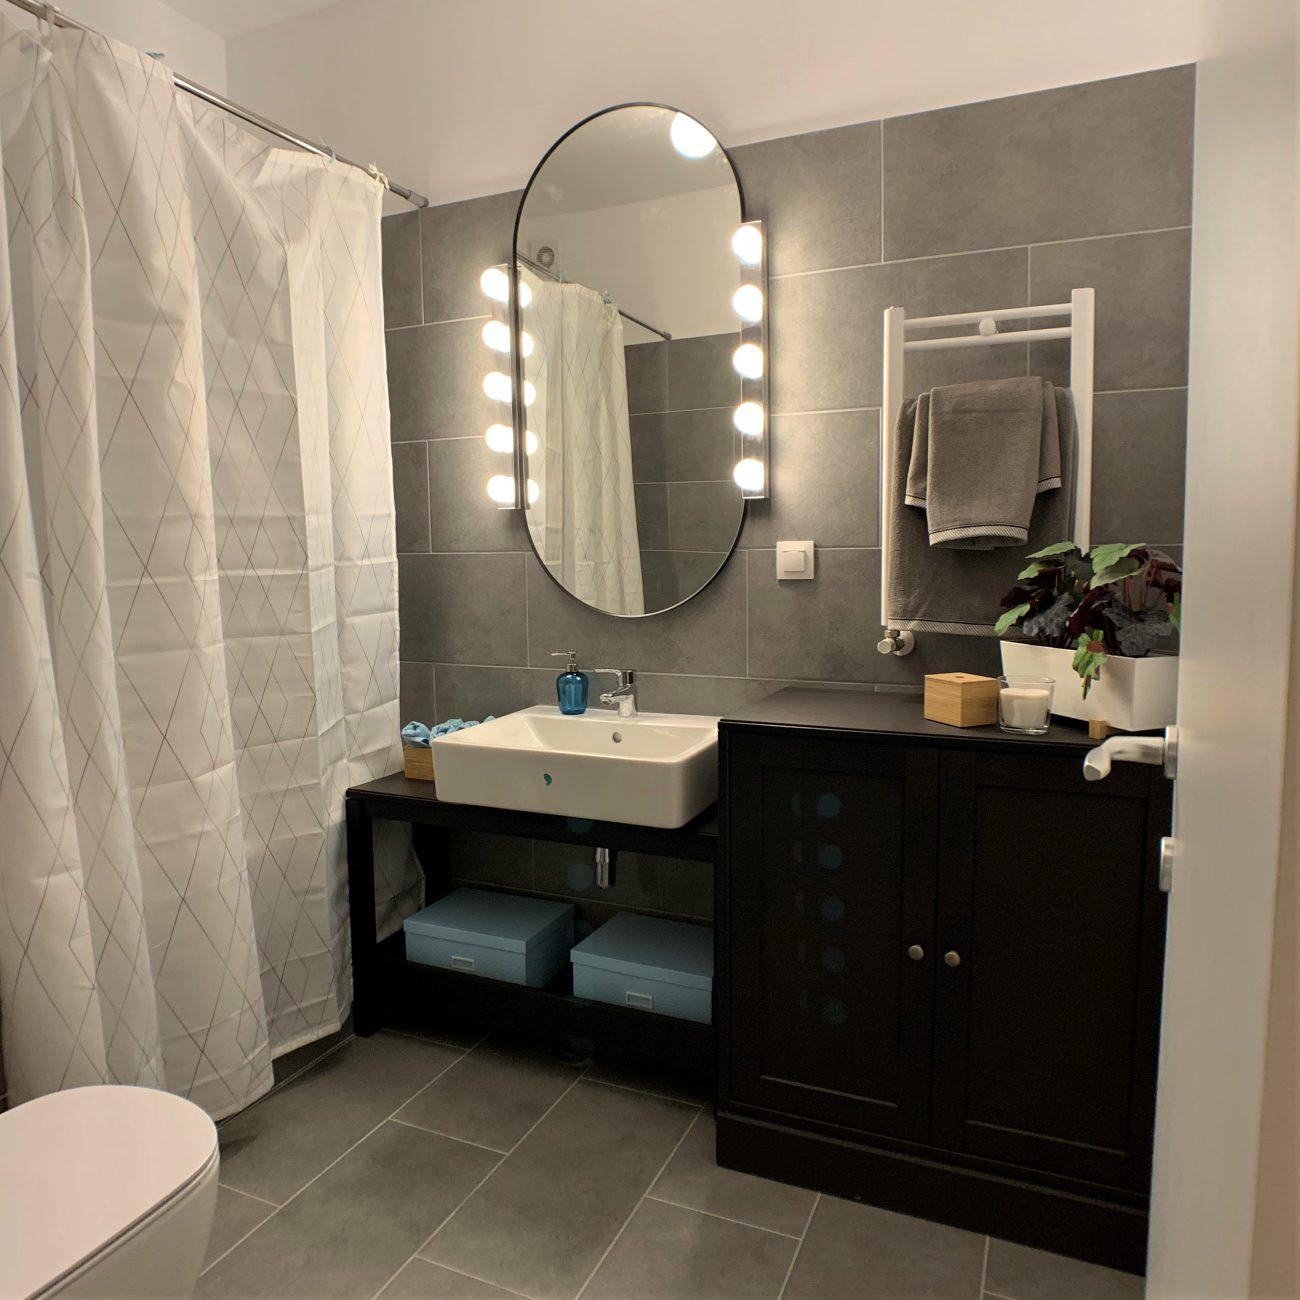 amenajarea noului model de apartament Atria Urban Resort